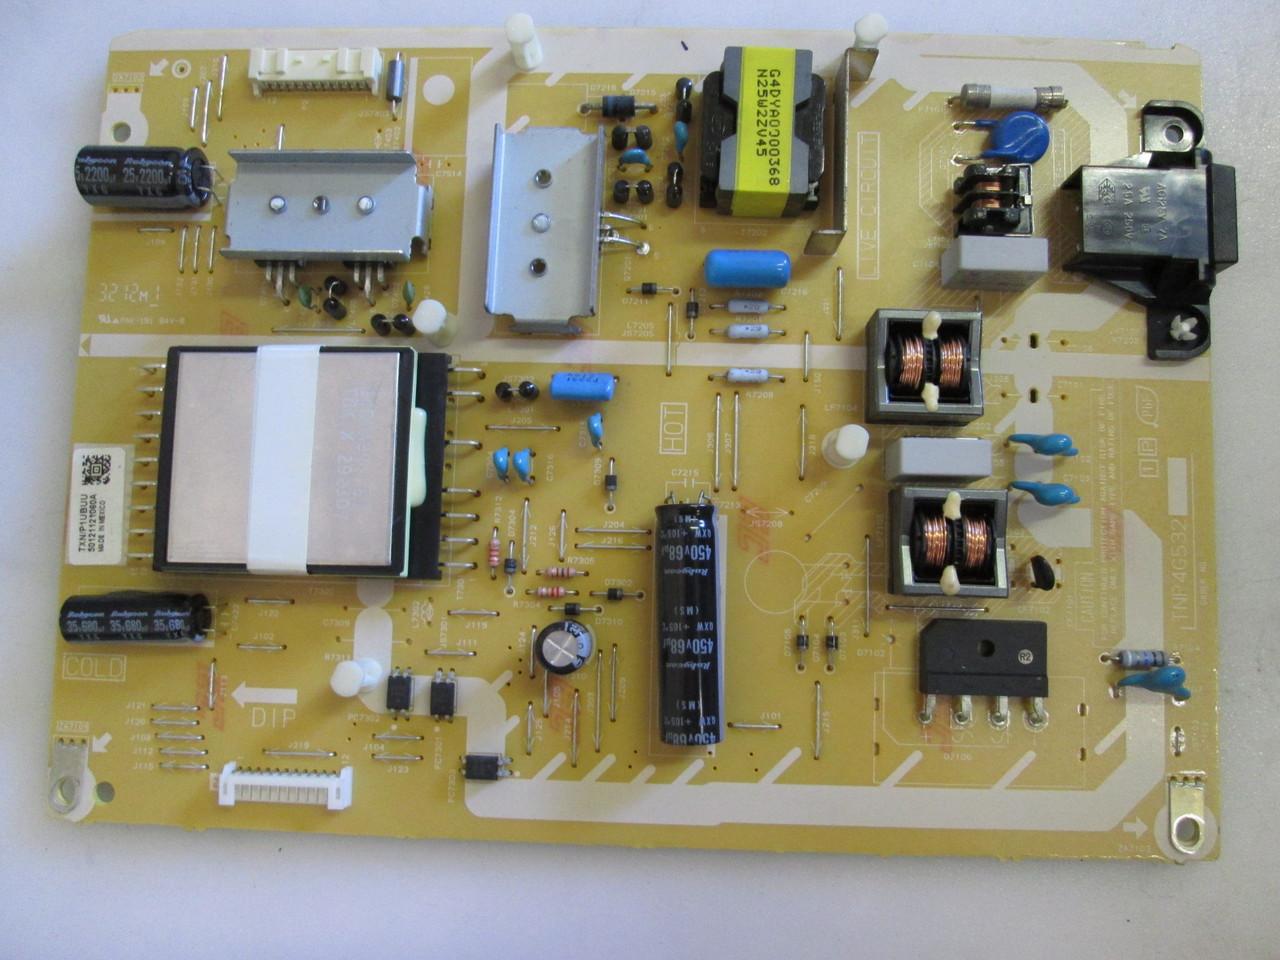 PANASONIC TNP4G532 TC-L50EM5 POWER SUPPLY on